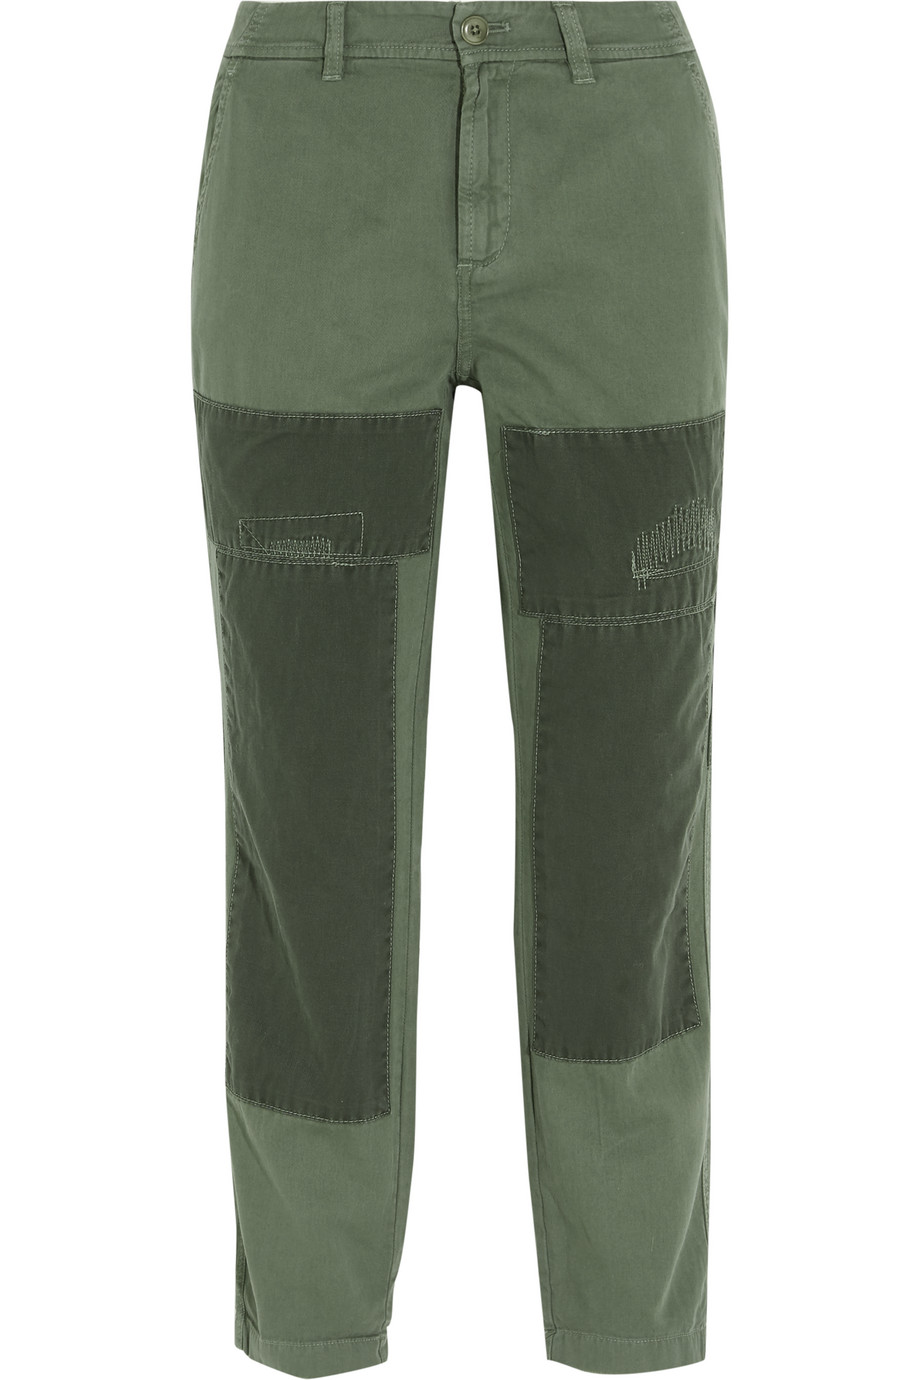 J.Crew Sunday Patchwork Cotton-Twill Straight-Leg Pants, Army Green, Women's, Size: 0